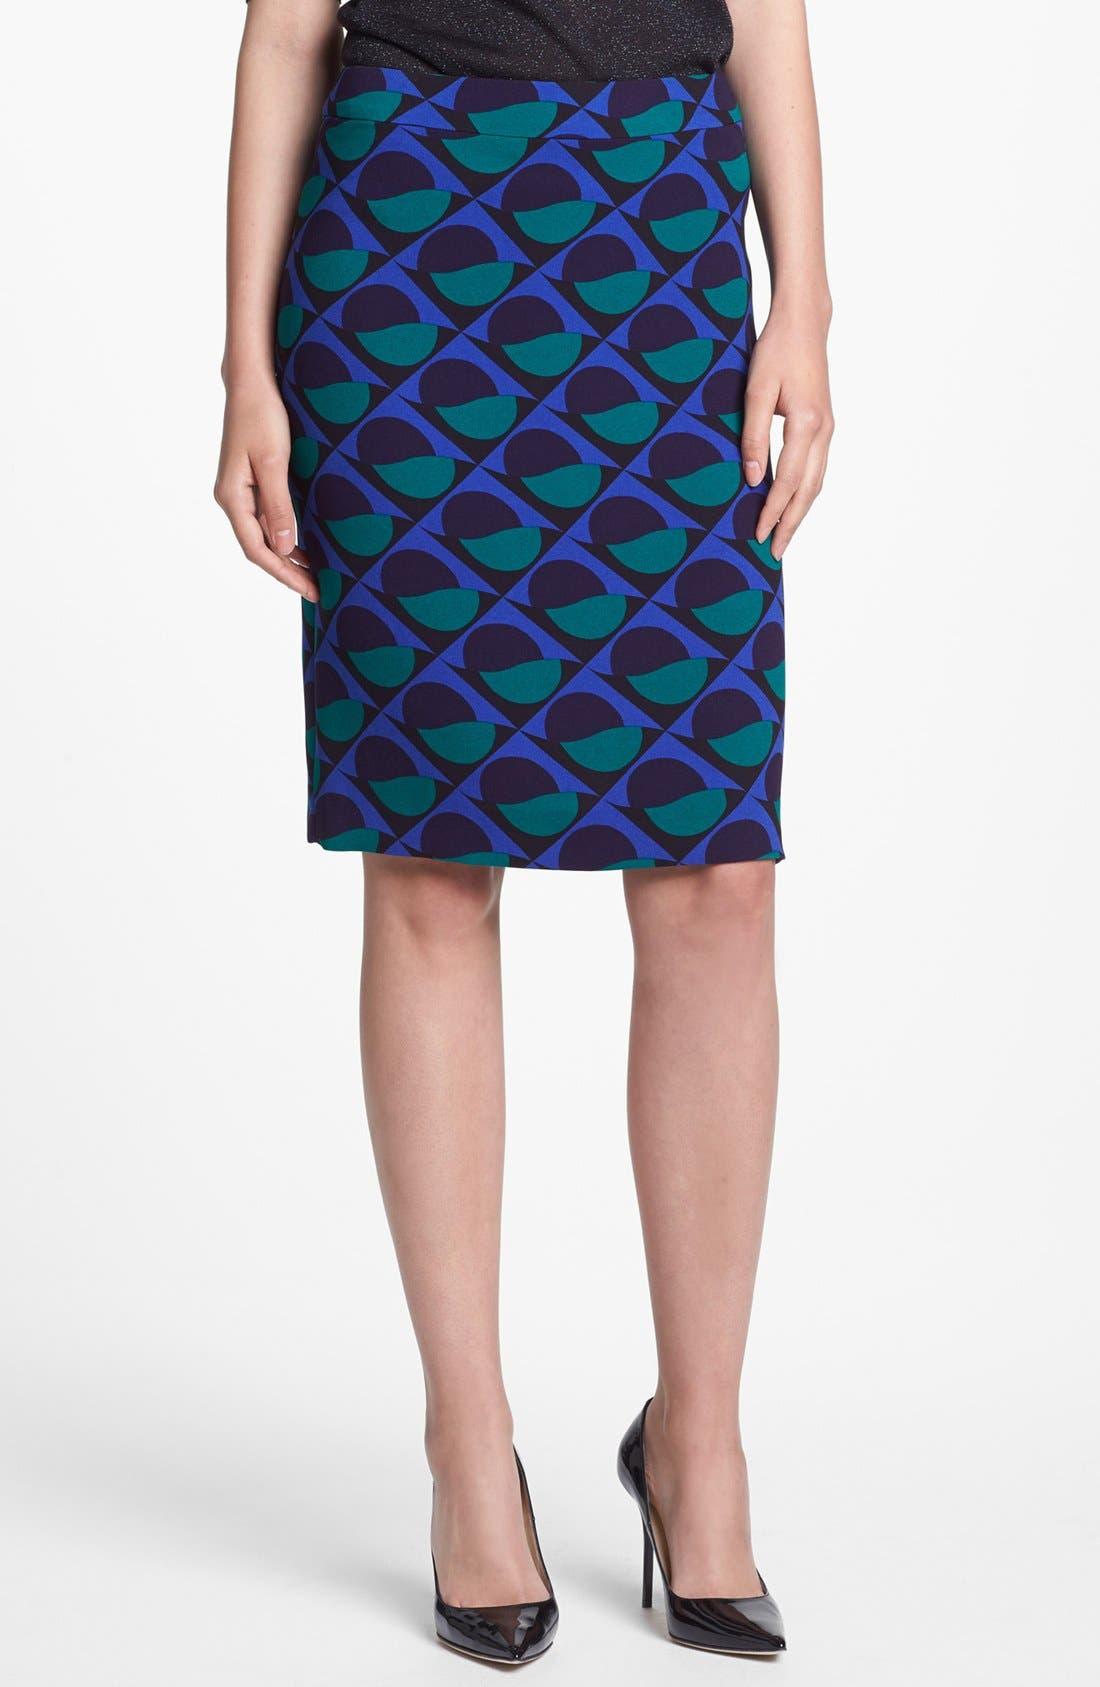 Main Image - MARC BY MARC JACOBS 'Etta' Print Pencil Skirt